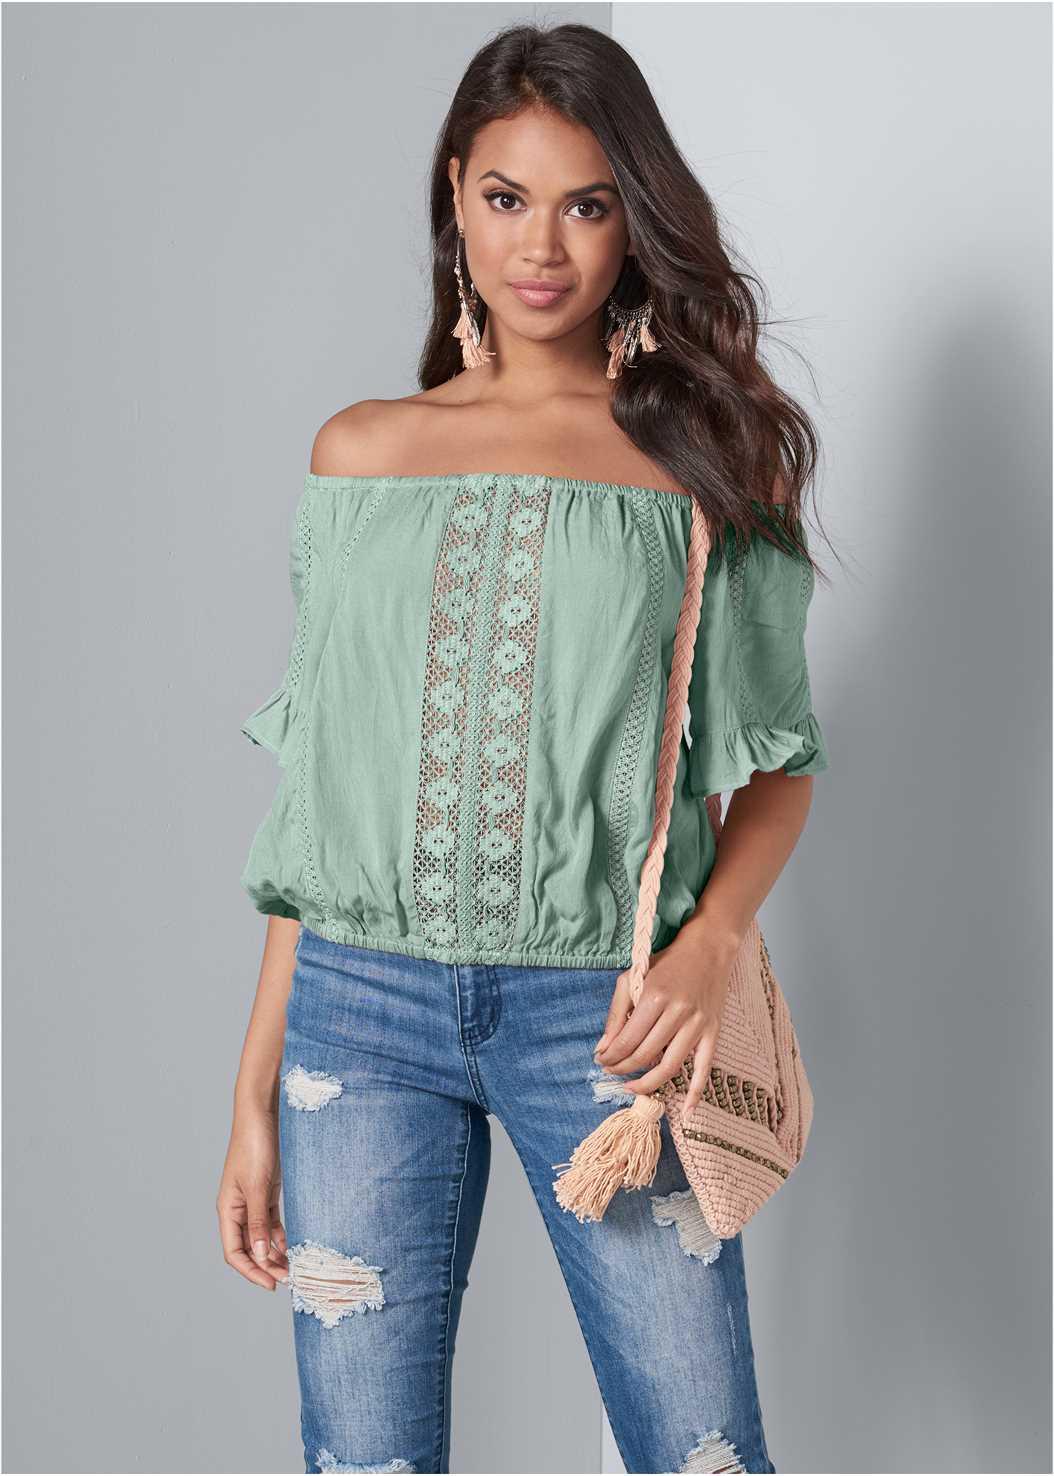 Off Shoulder Crochet Top,Triangle Hem Jeans,Tassel Detail Hoop Earrings,Bead Detail Crochet Bag